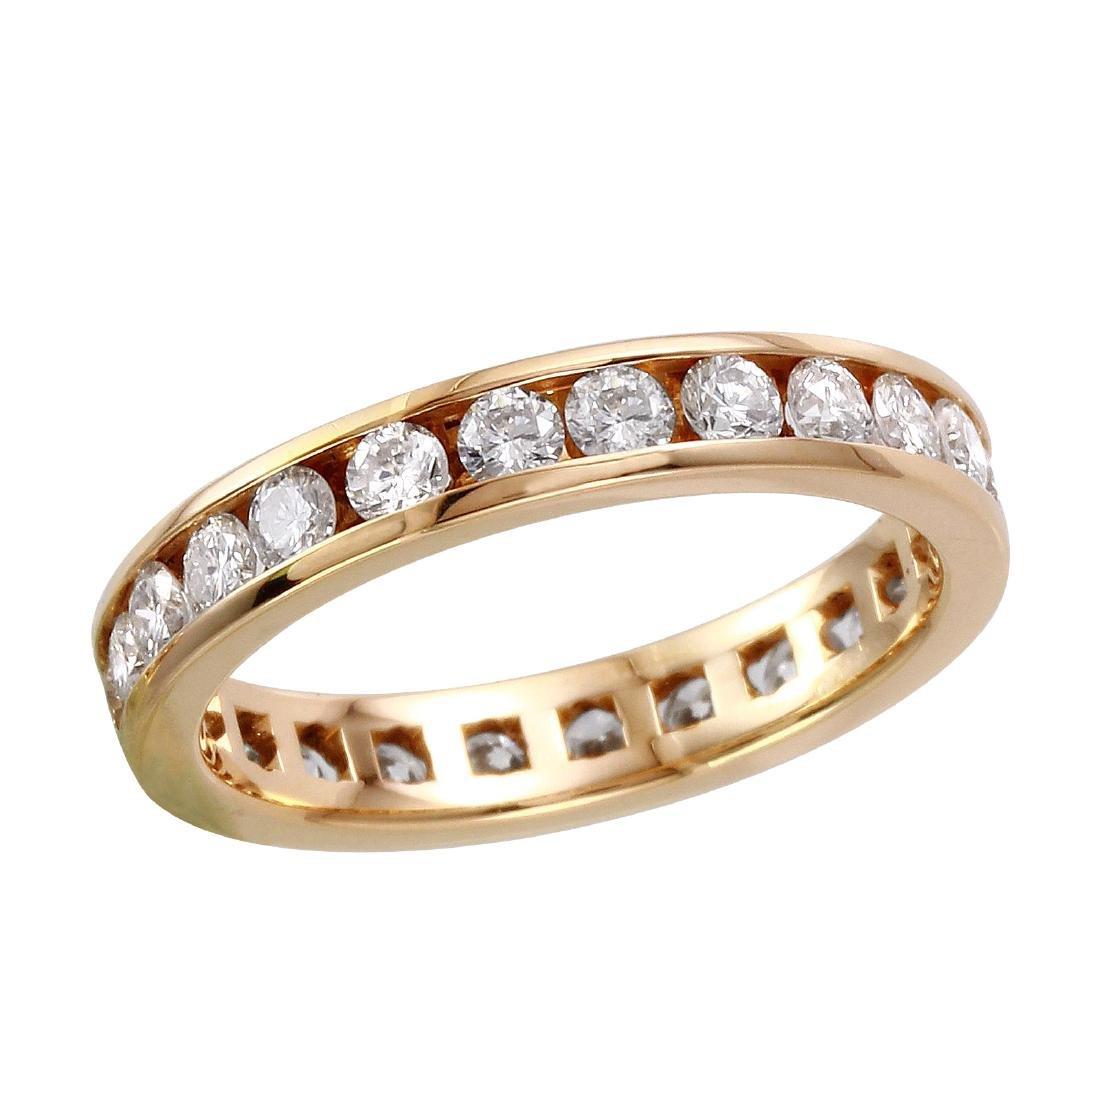 14KT Yellow Gold Diamond Eternity Ring